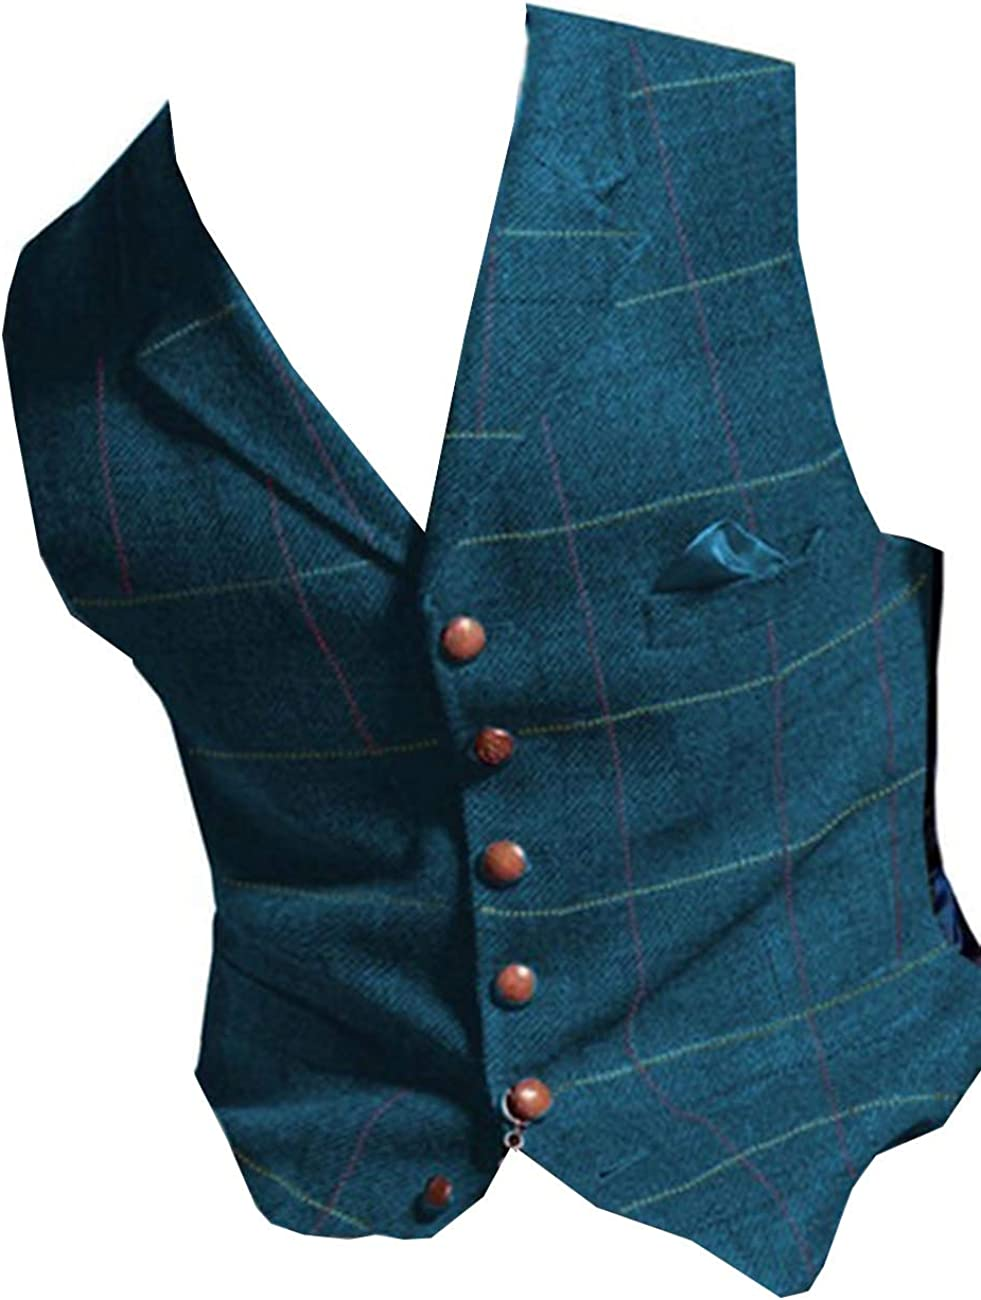 RONGKIM Men's Plaid Vest Tweed Waistcoat Slim Fit Lapel Plaid Suit Vest Casual Groomsmen Tuxedo for Wedding